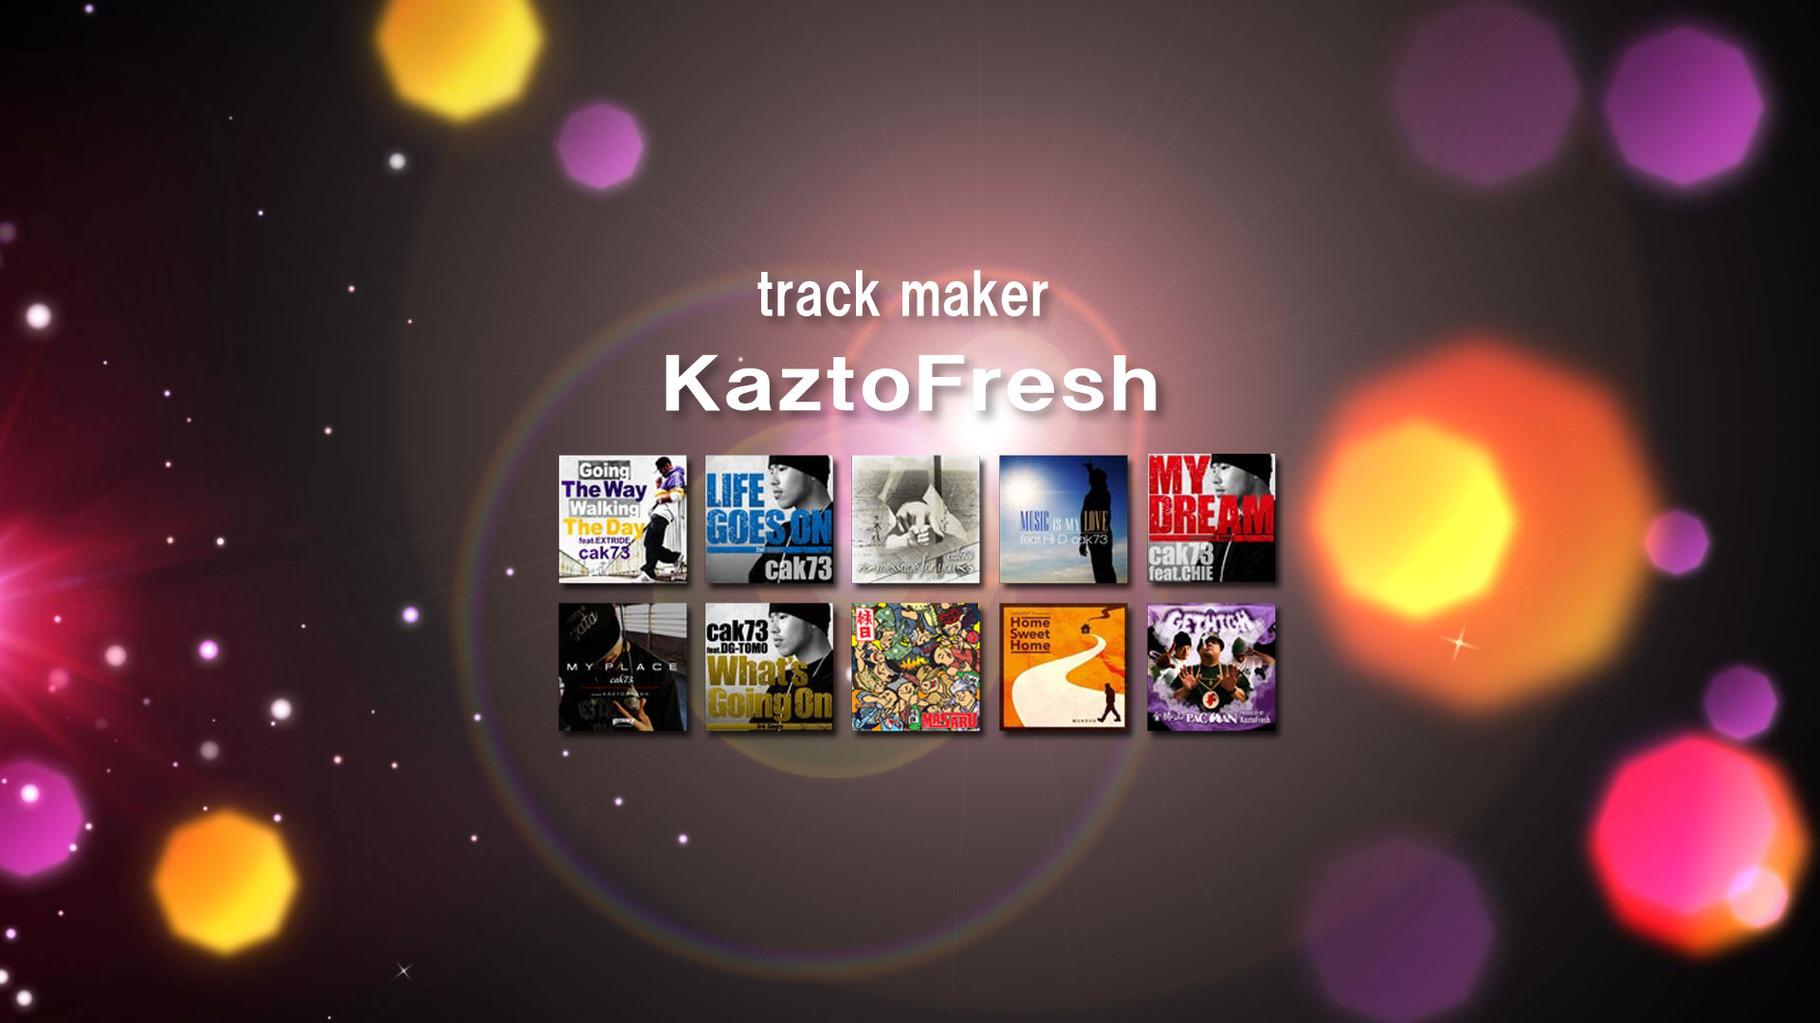 Track maker KaztoFresh